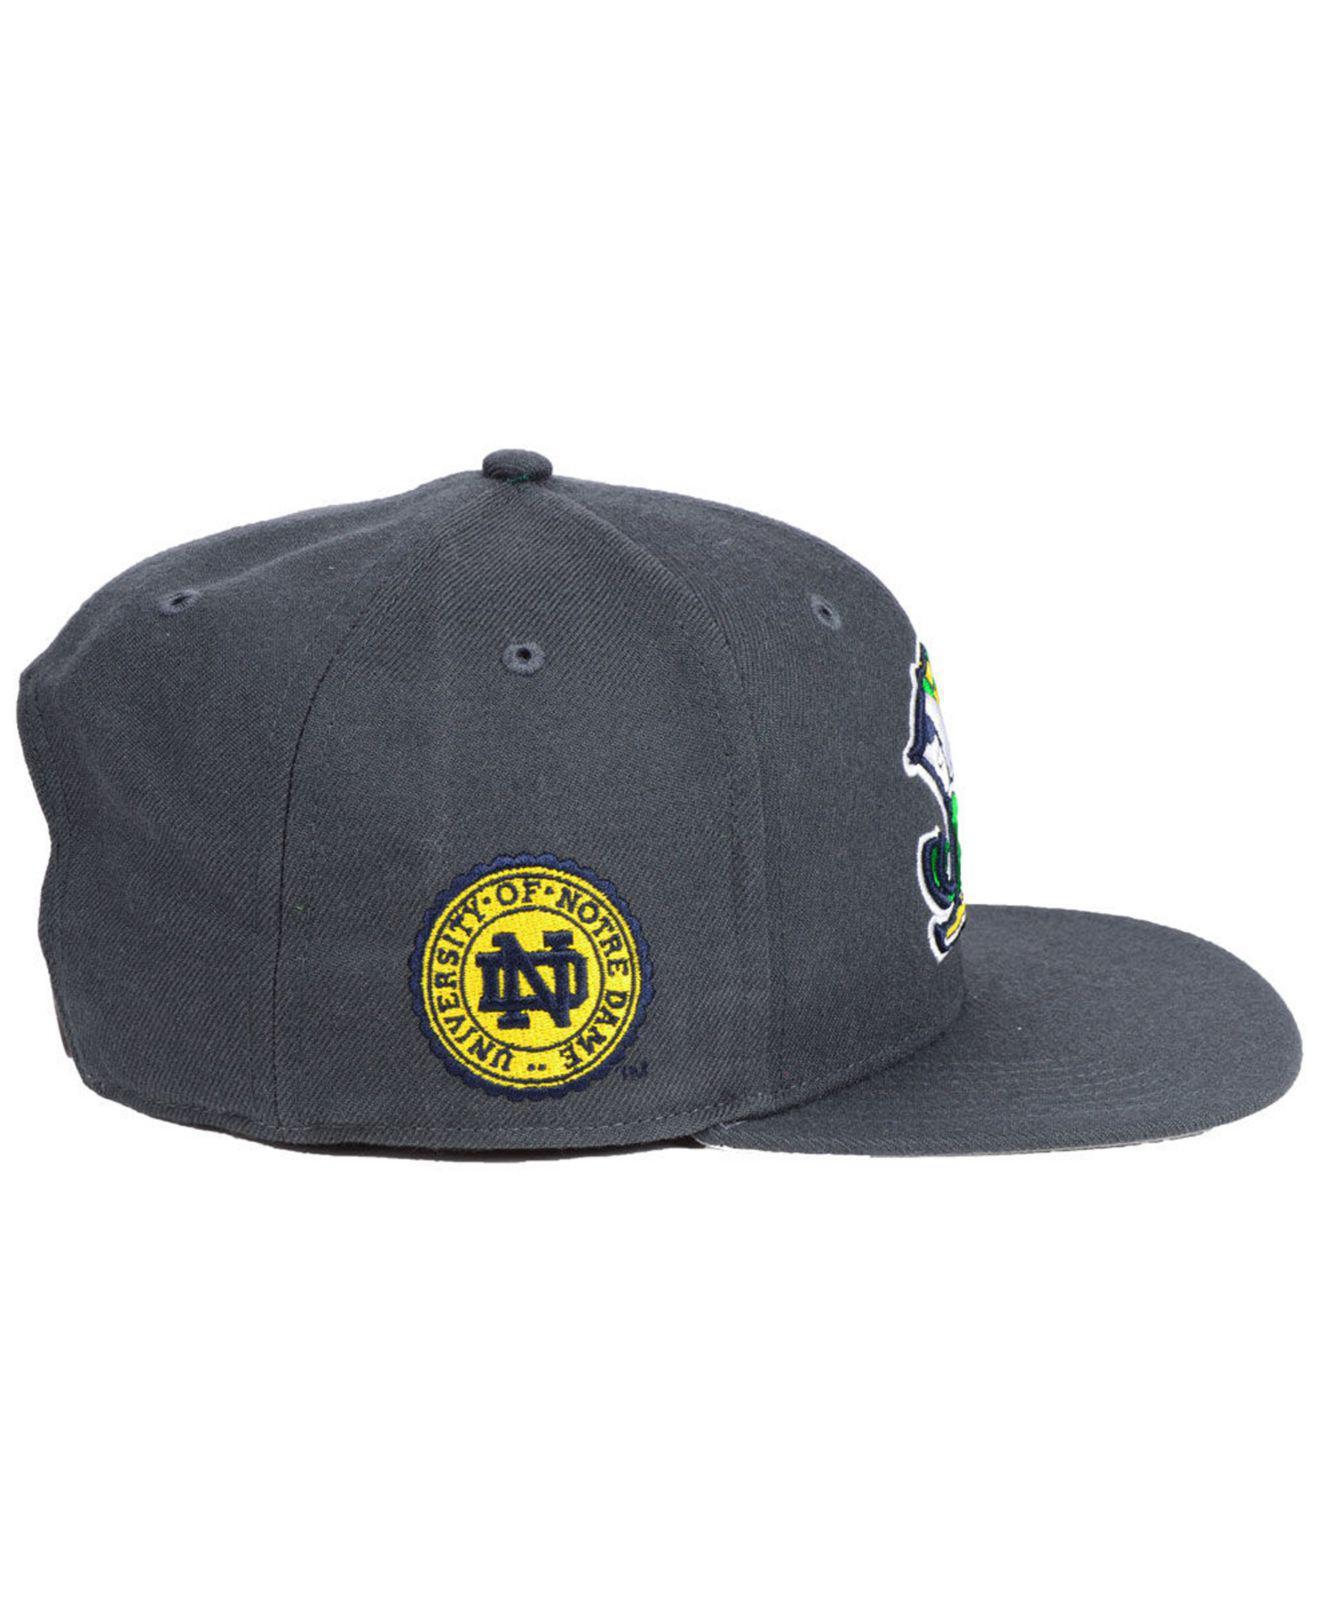 innovative design c93fa 13330 47 Brand Notre Dame Fighting Irish Sure Shot Captain Snapback Cap in Gray  for Men - Lyst